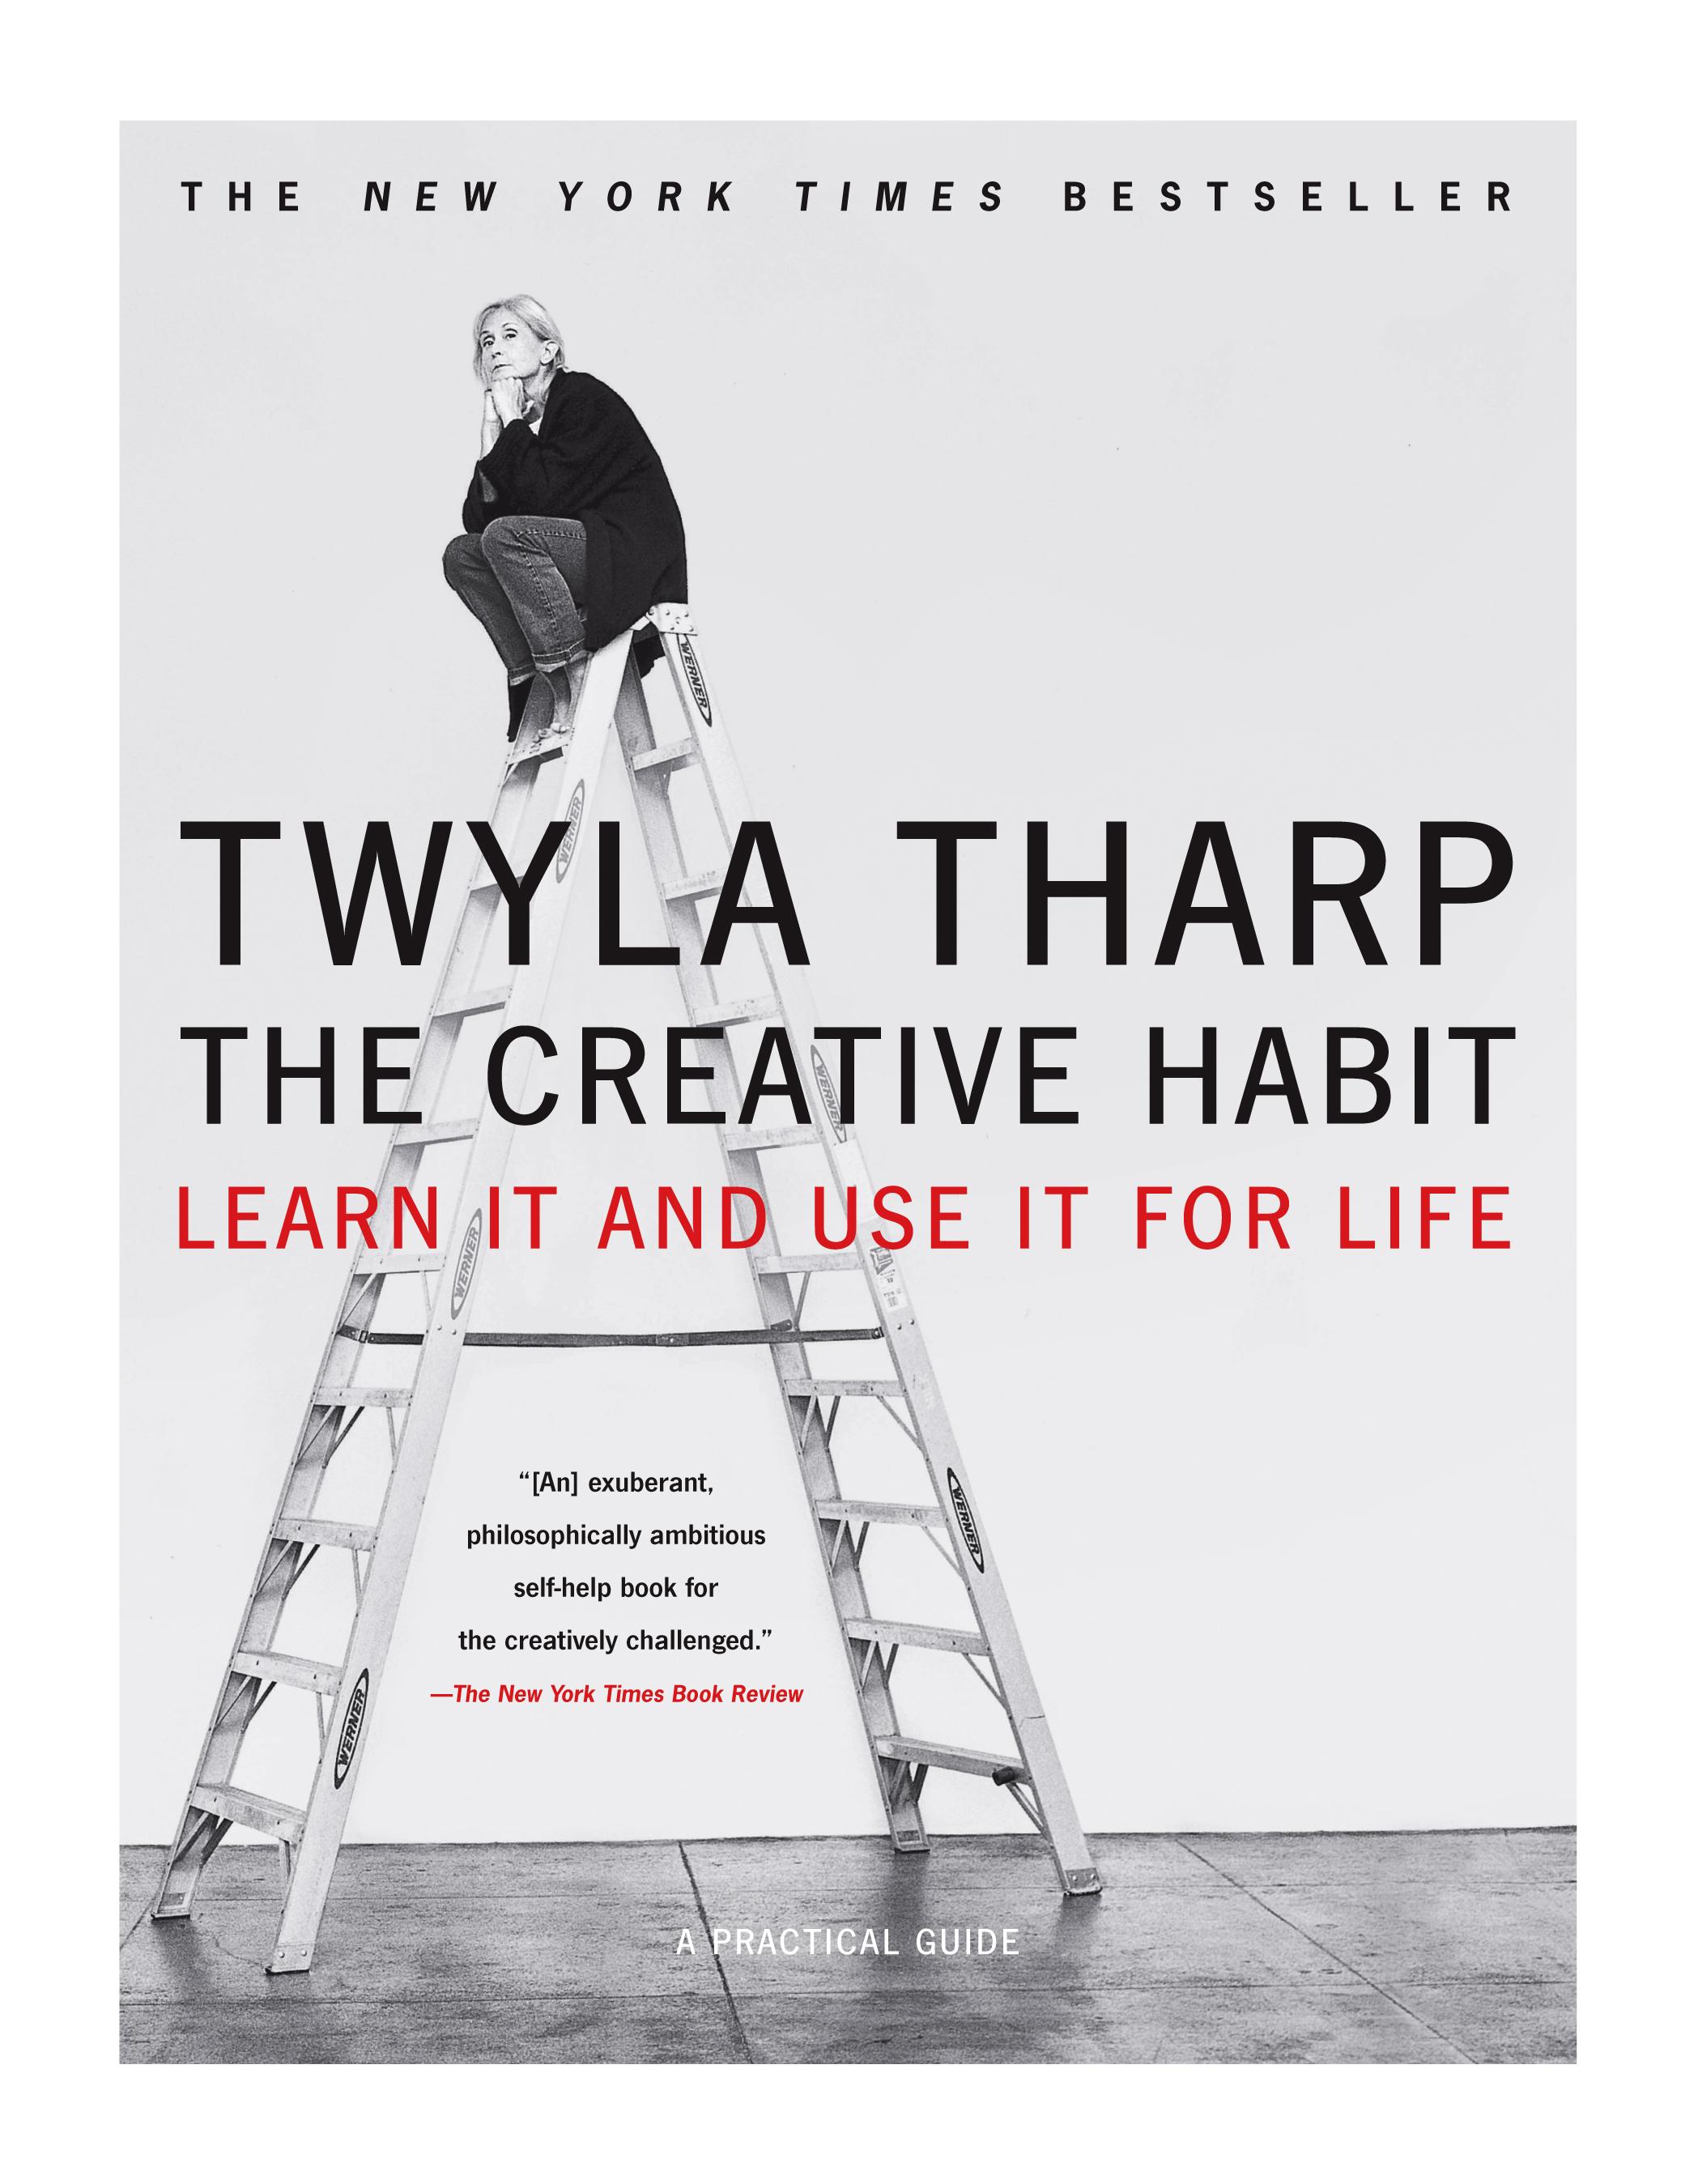 Twyla Tharp The Creative Habit